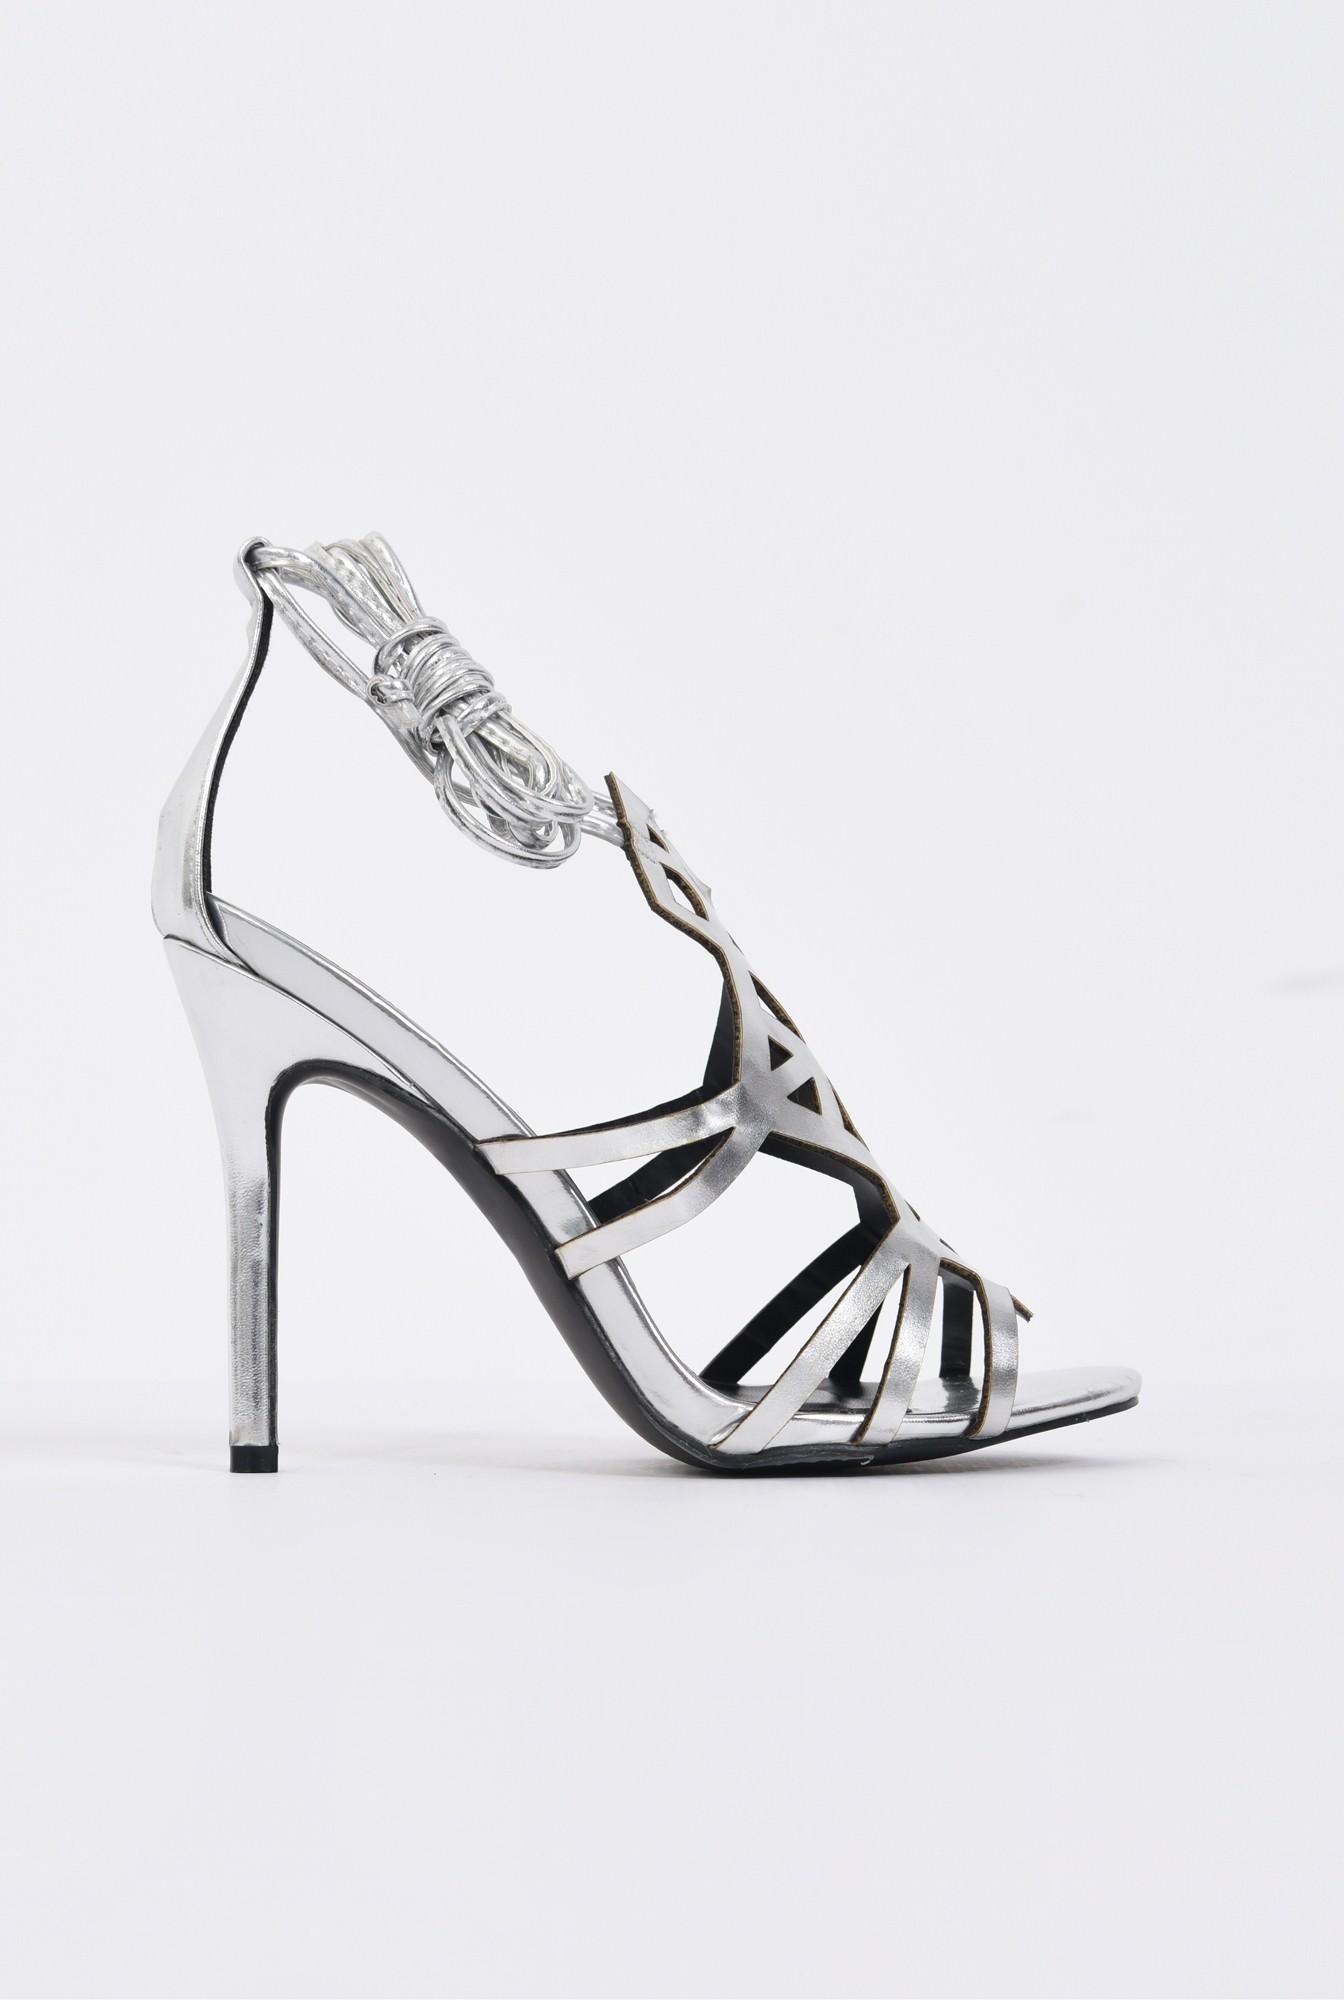 0 - sandale elegante, argintii, metalizate, stiletto